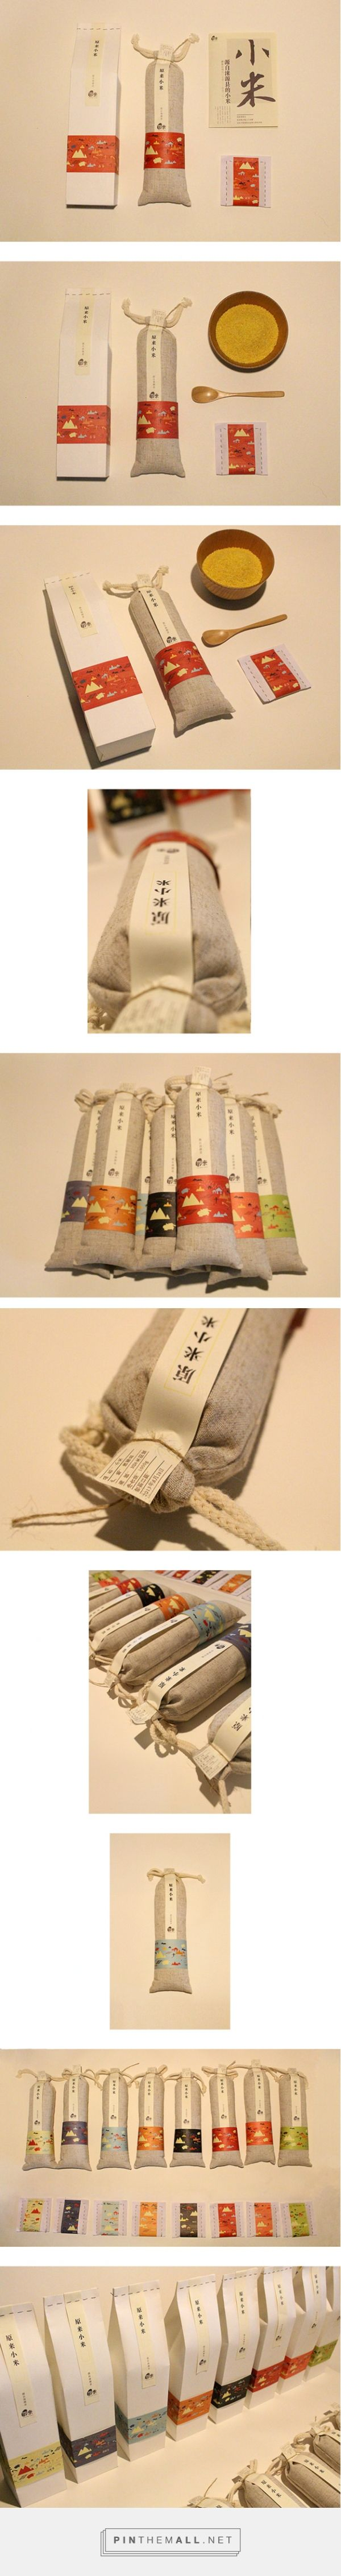 【烩设计】极具东方神韵的新中式包装-烩设计-微头条. Nice packaging of something (maybe rice) PD